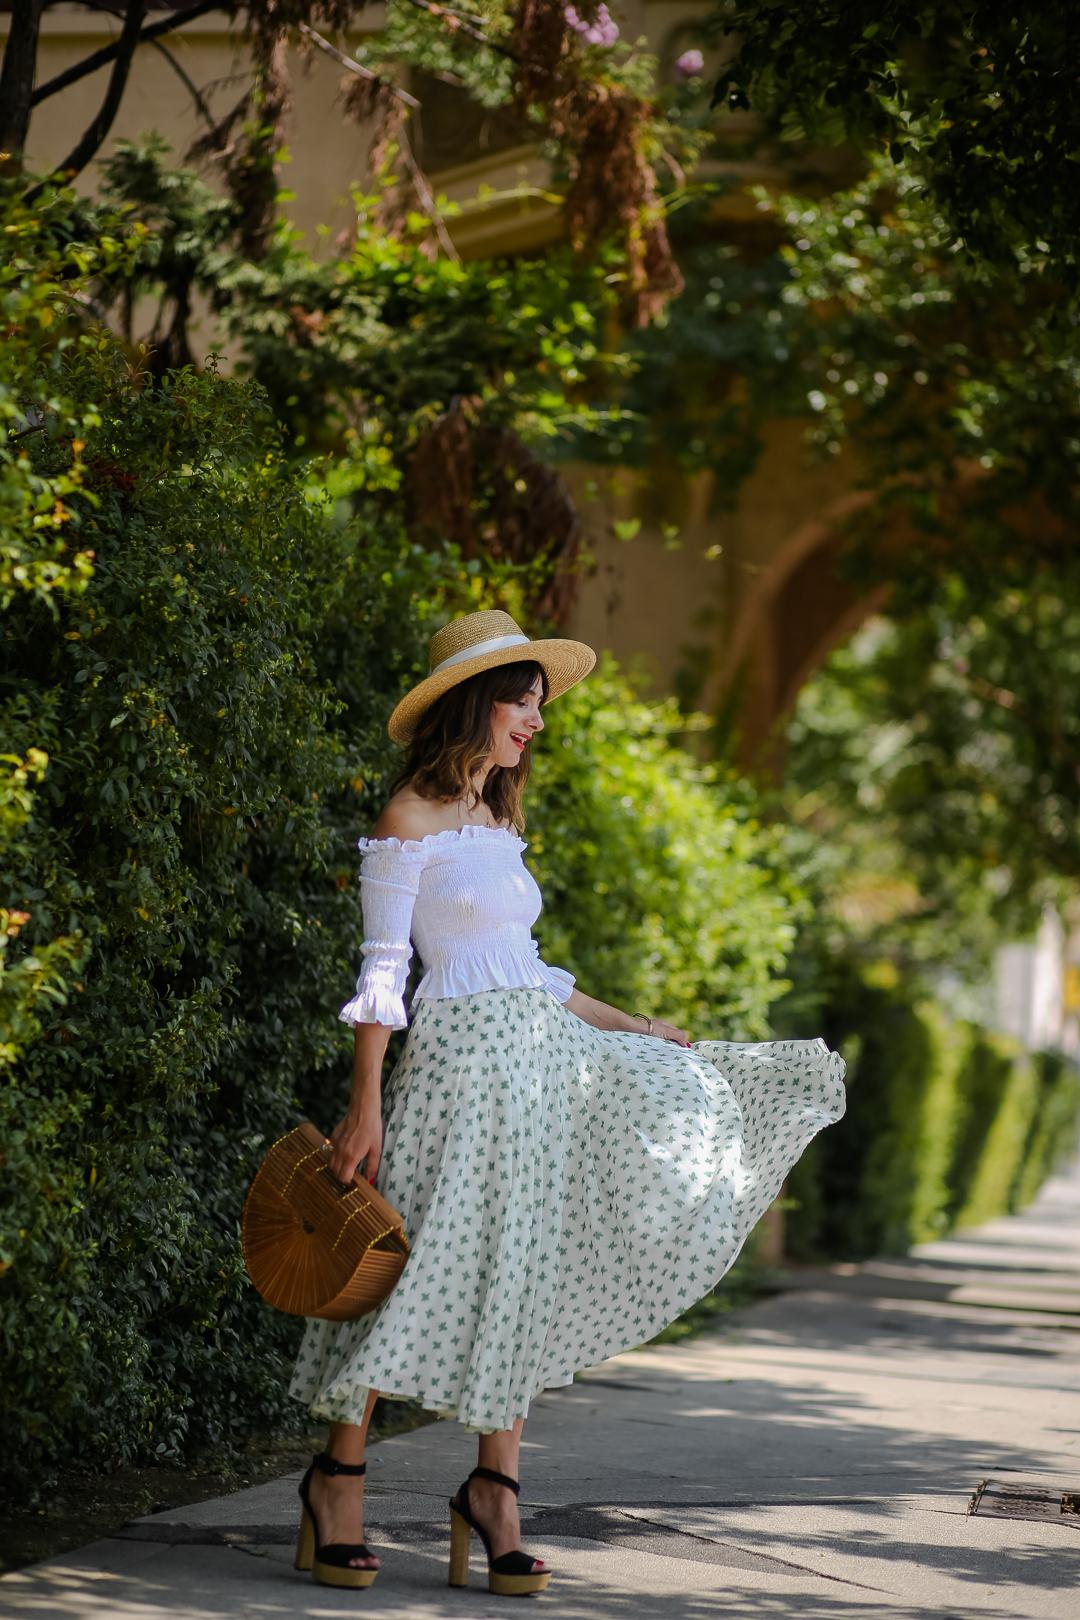 vintage oscar de la renta skirt outfit ideas